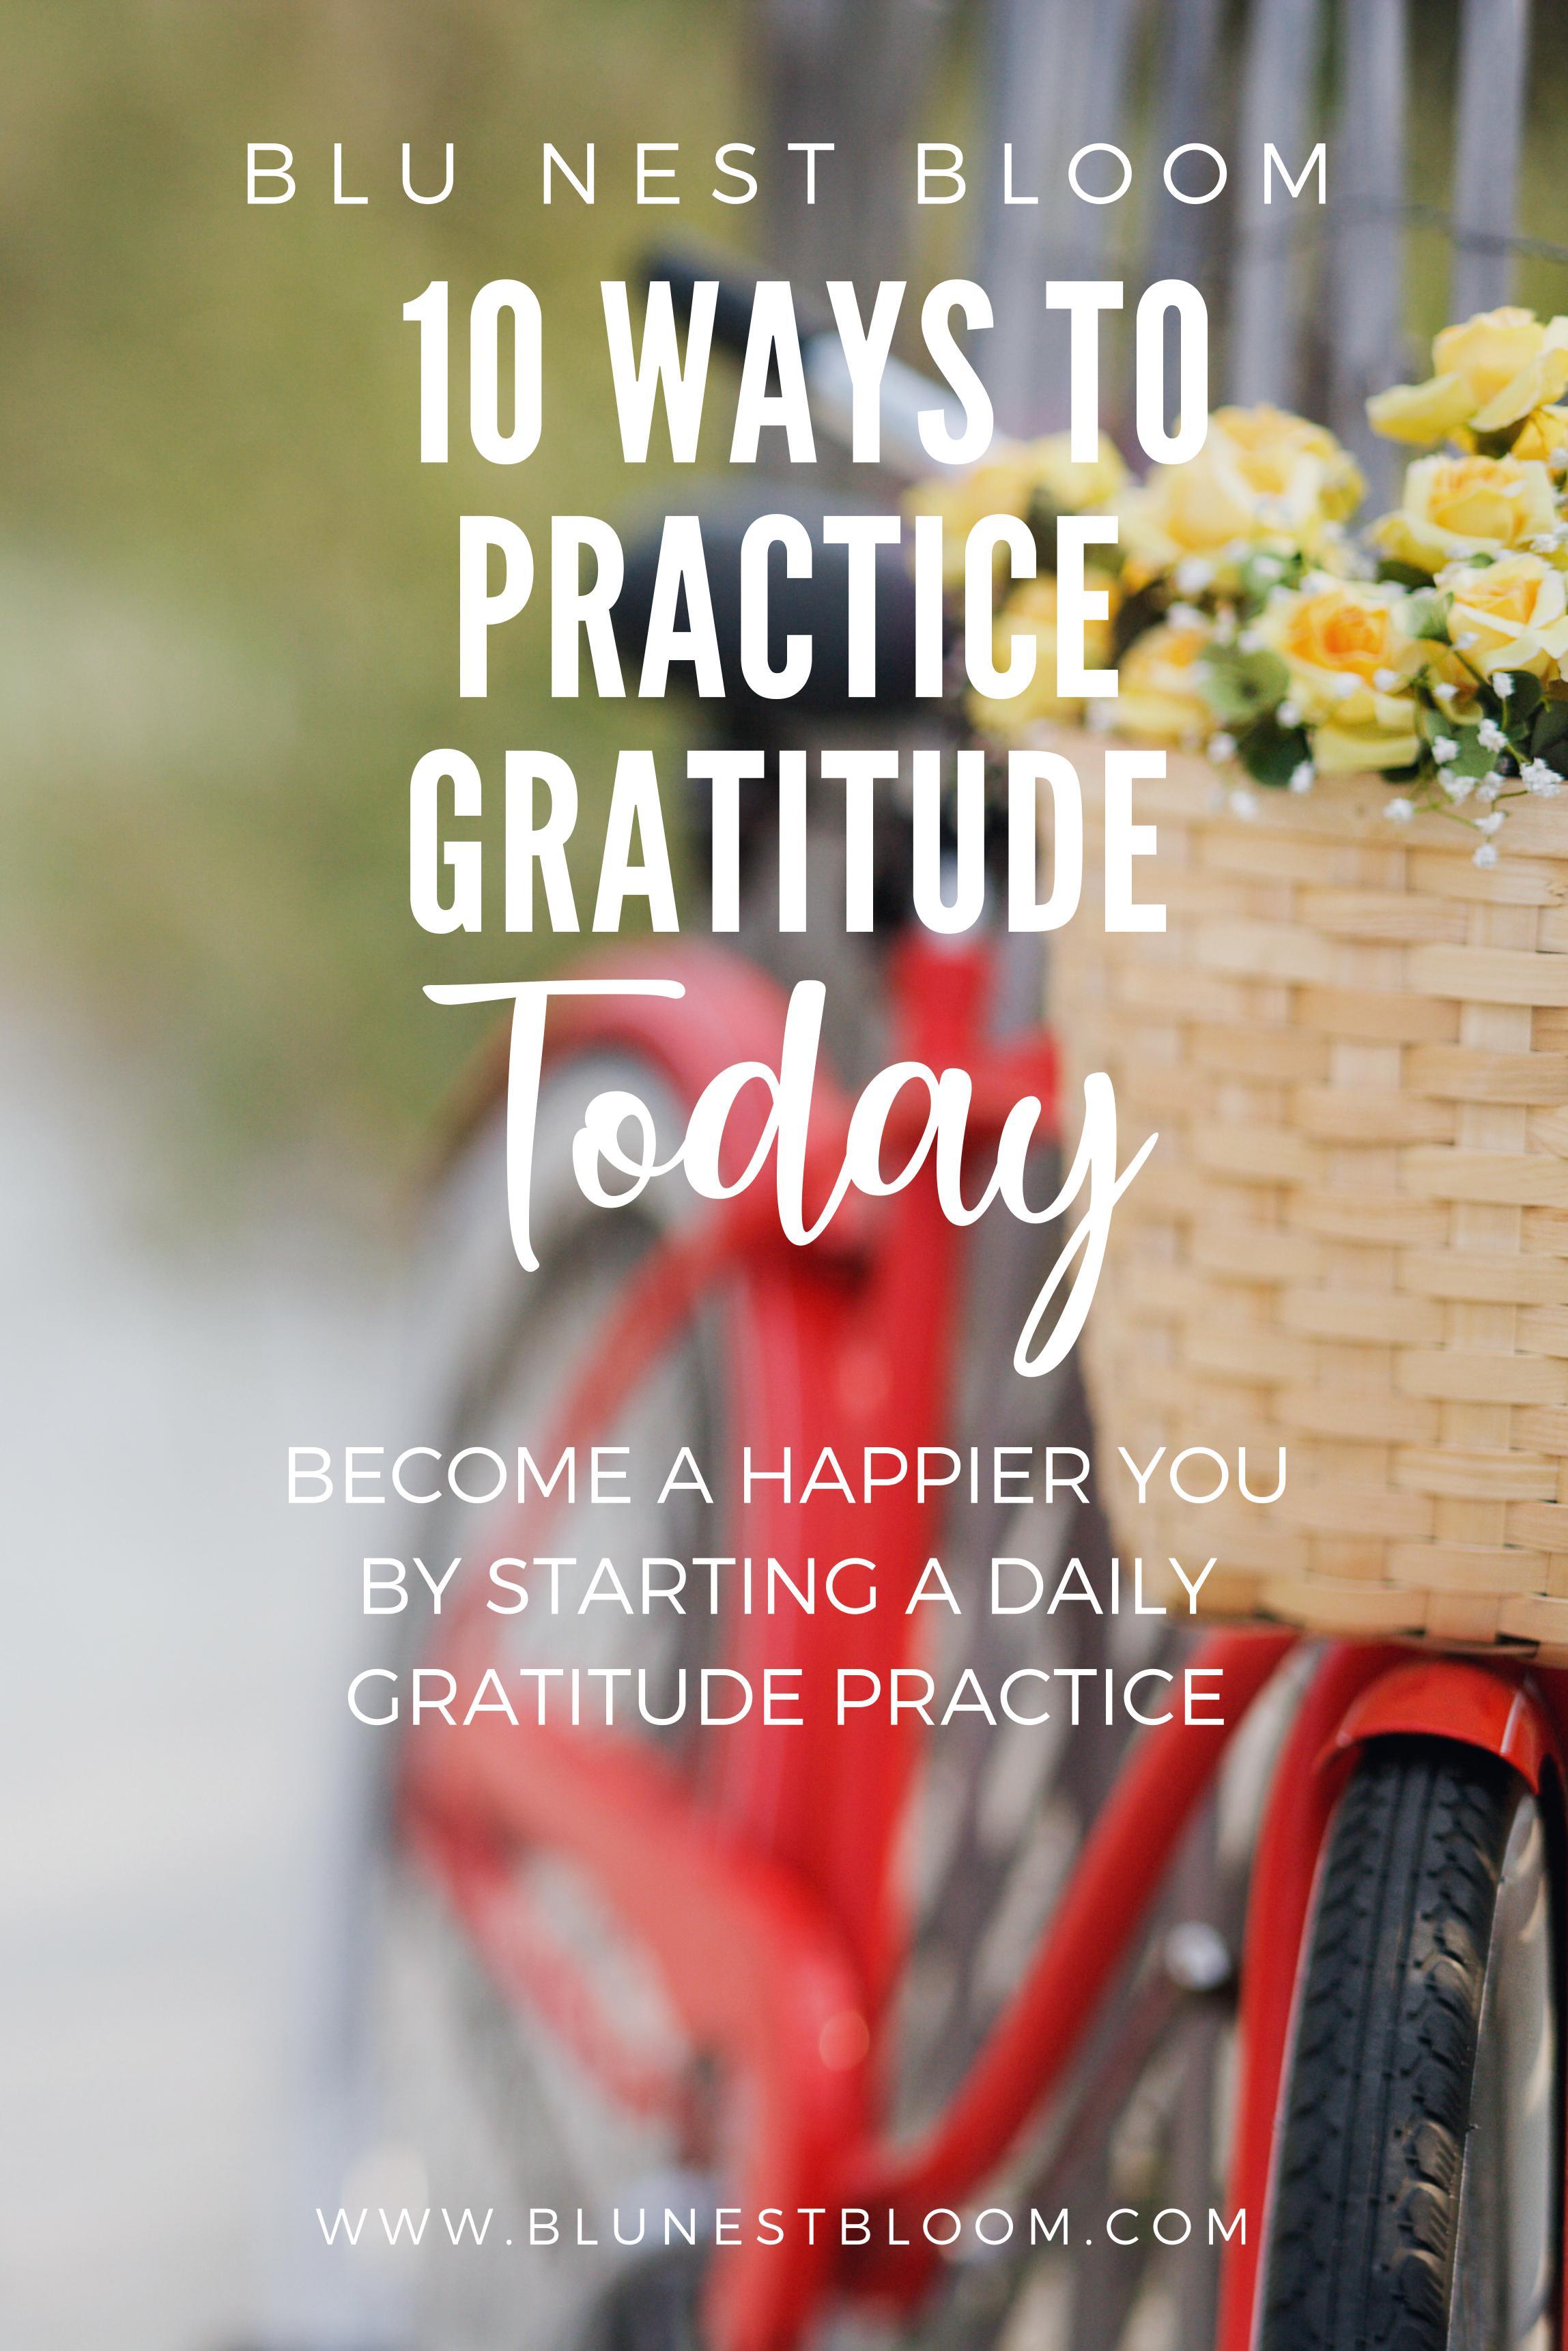 10 Ways To Practice Gratitude Today